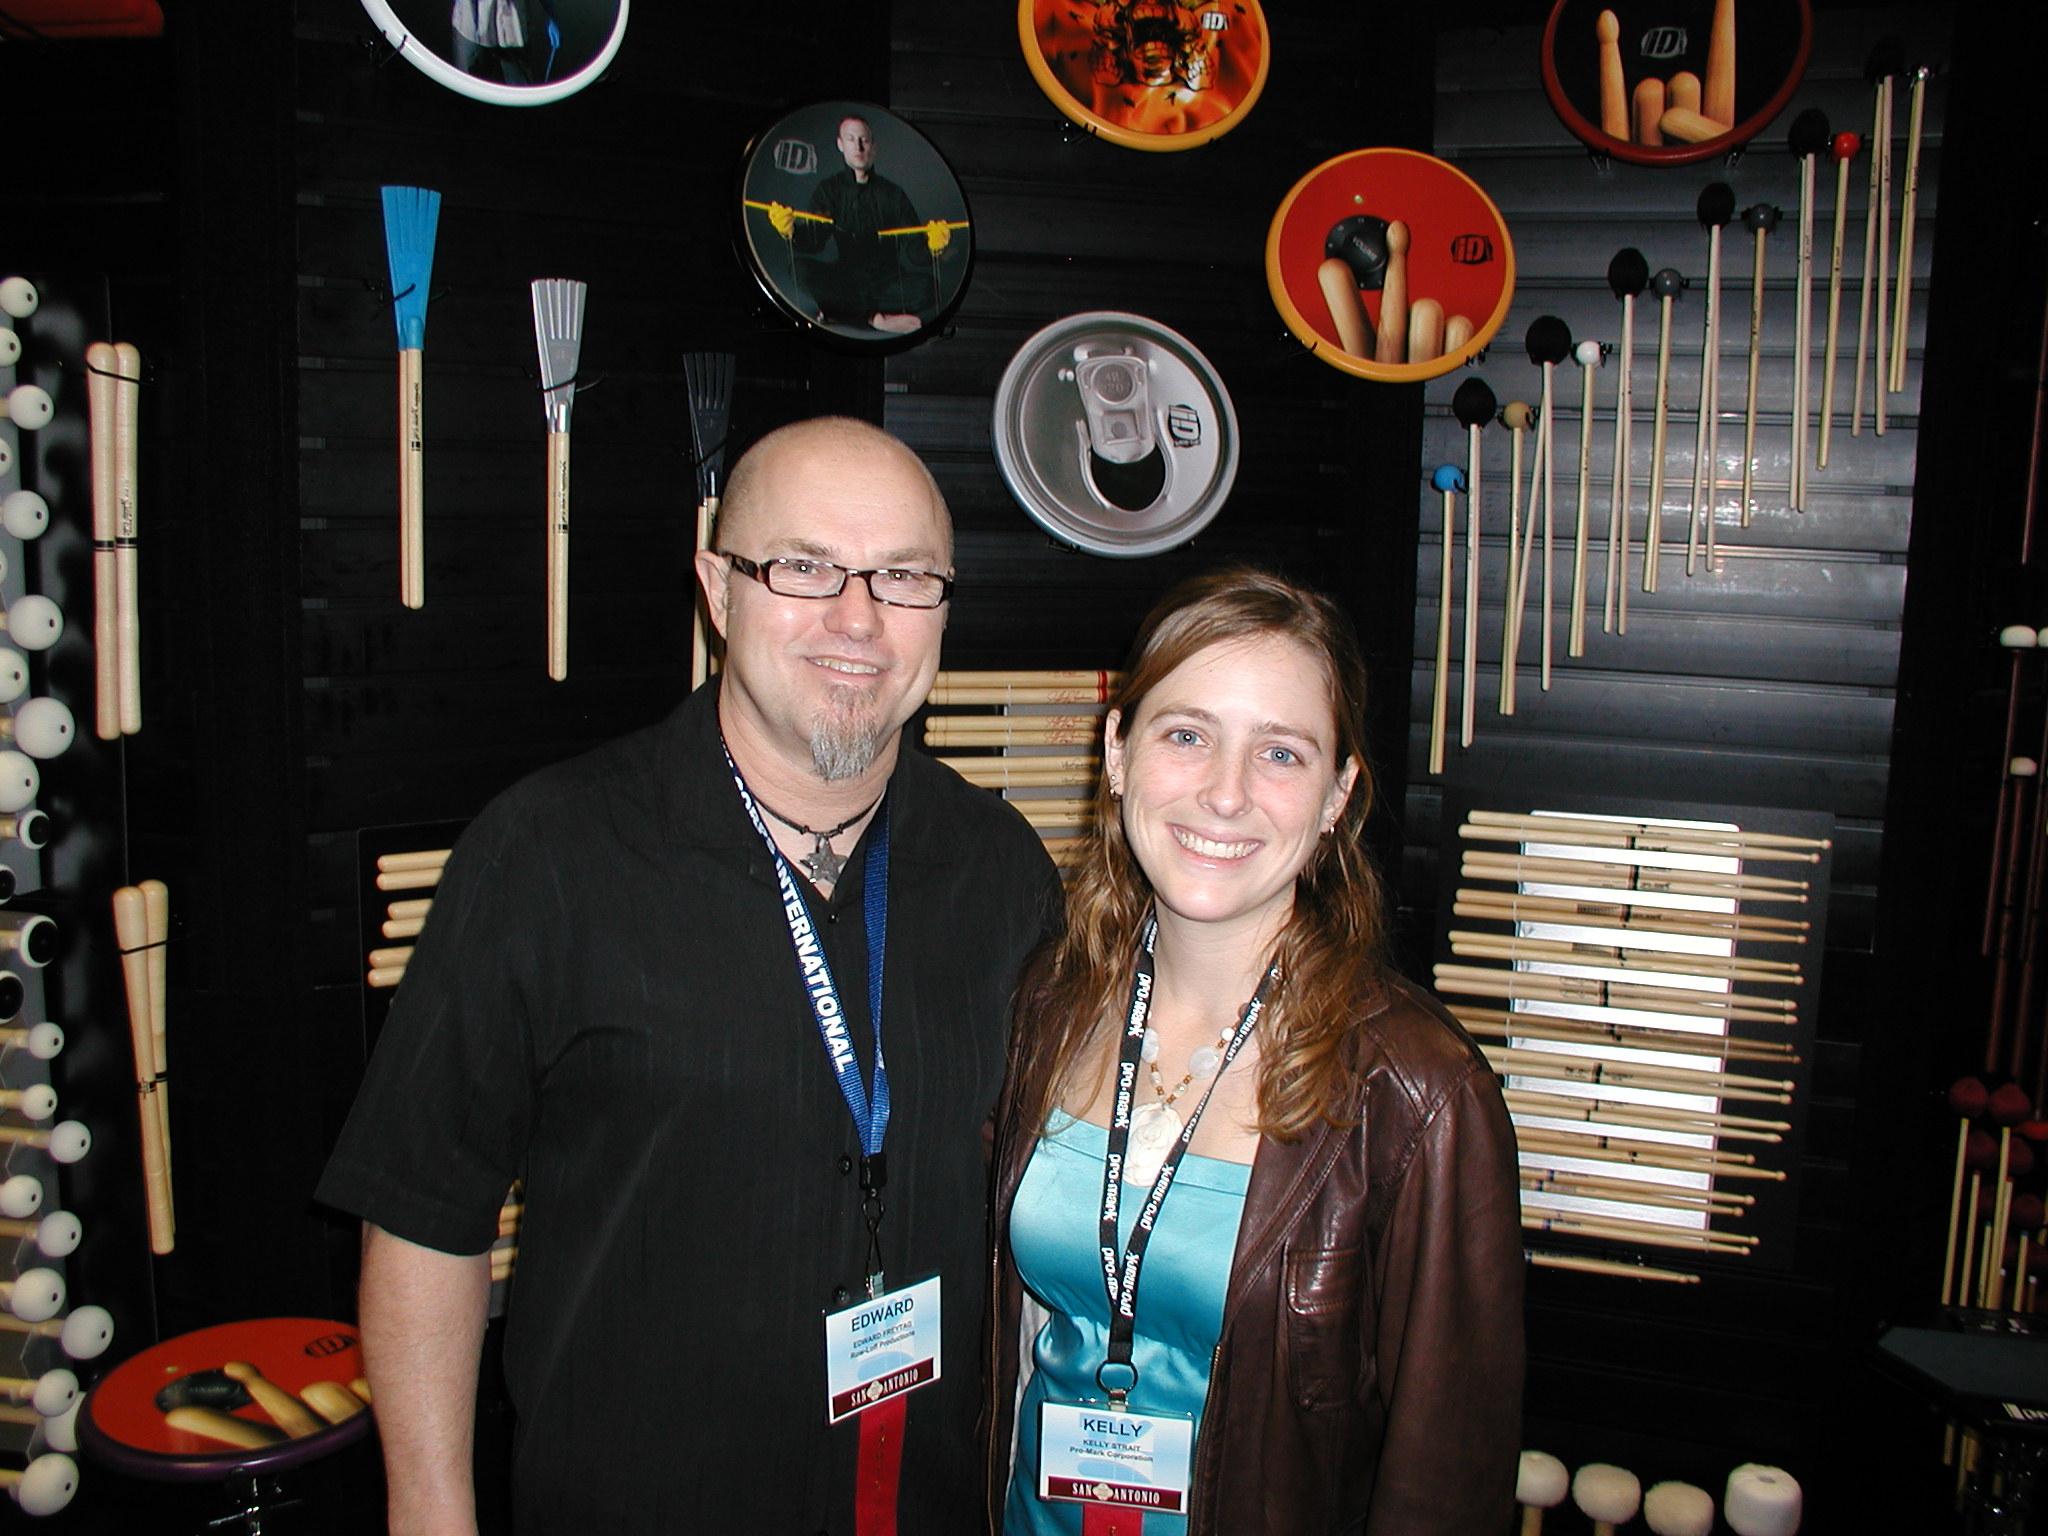 Edward with Kelly Strait, 2010